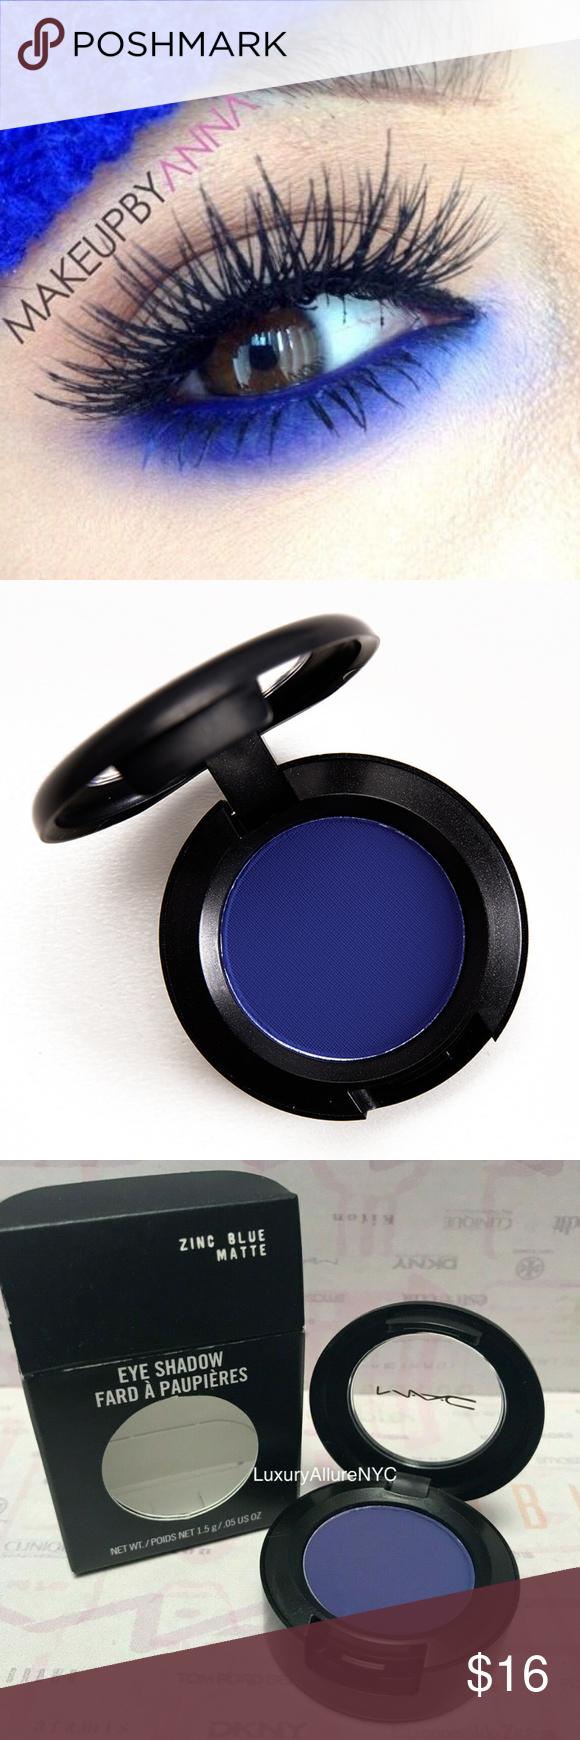 NIB MAC Eyeshadow ZINC BLUE MATTE Mac eyeshadow